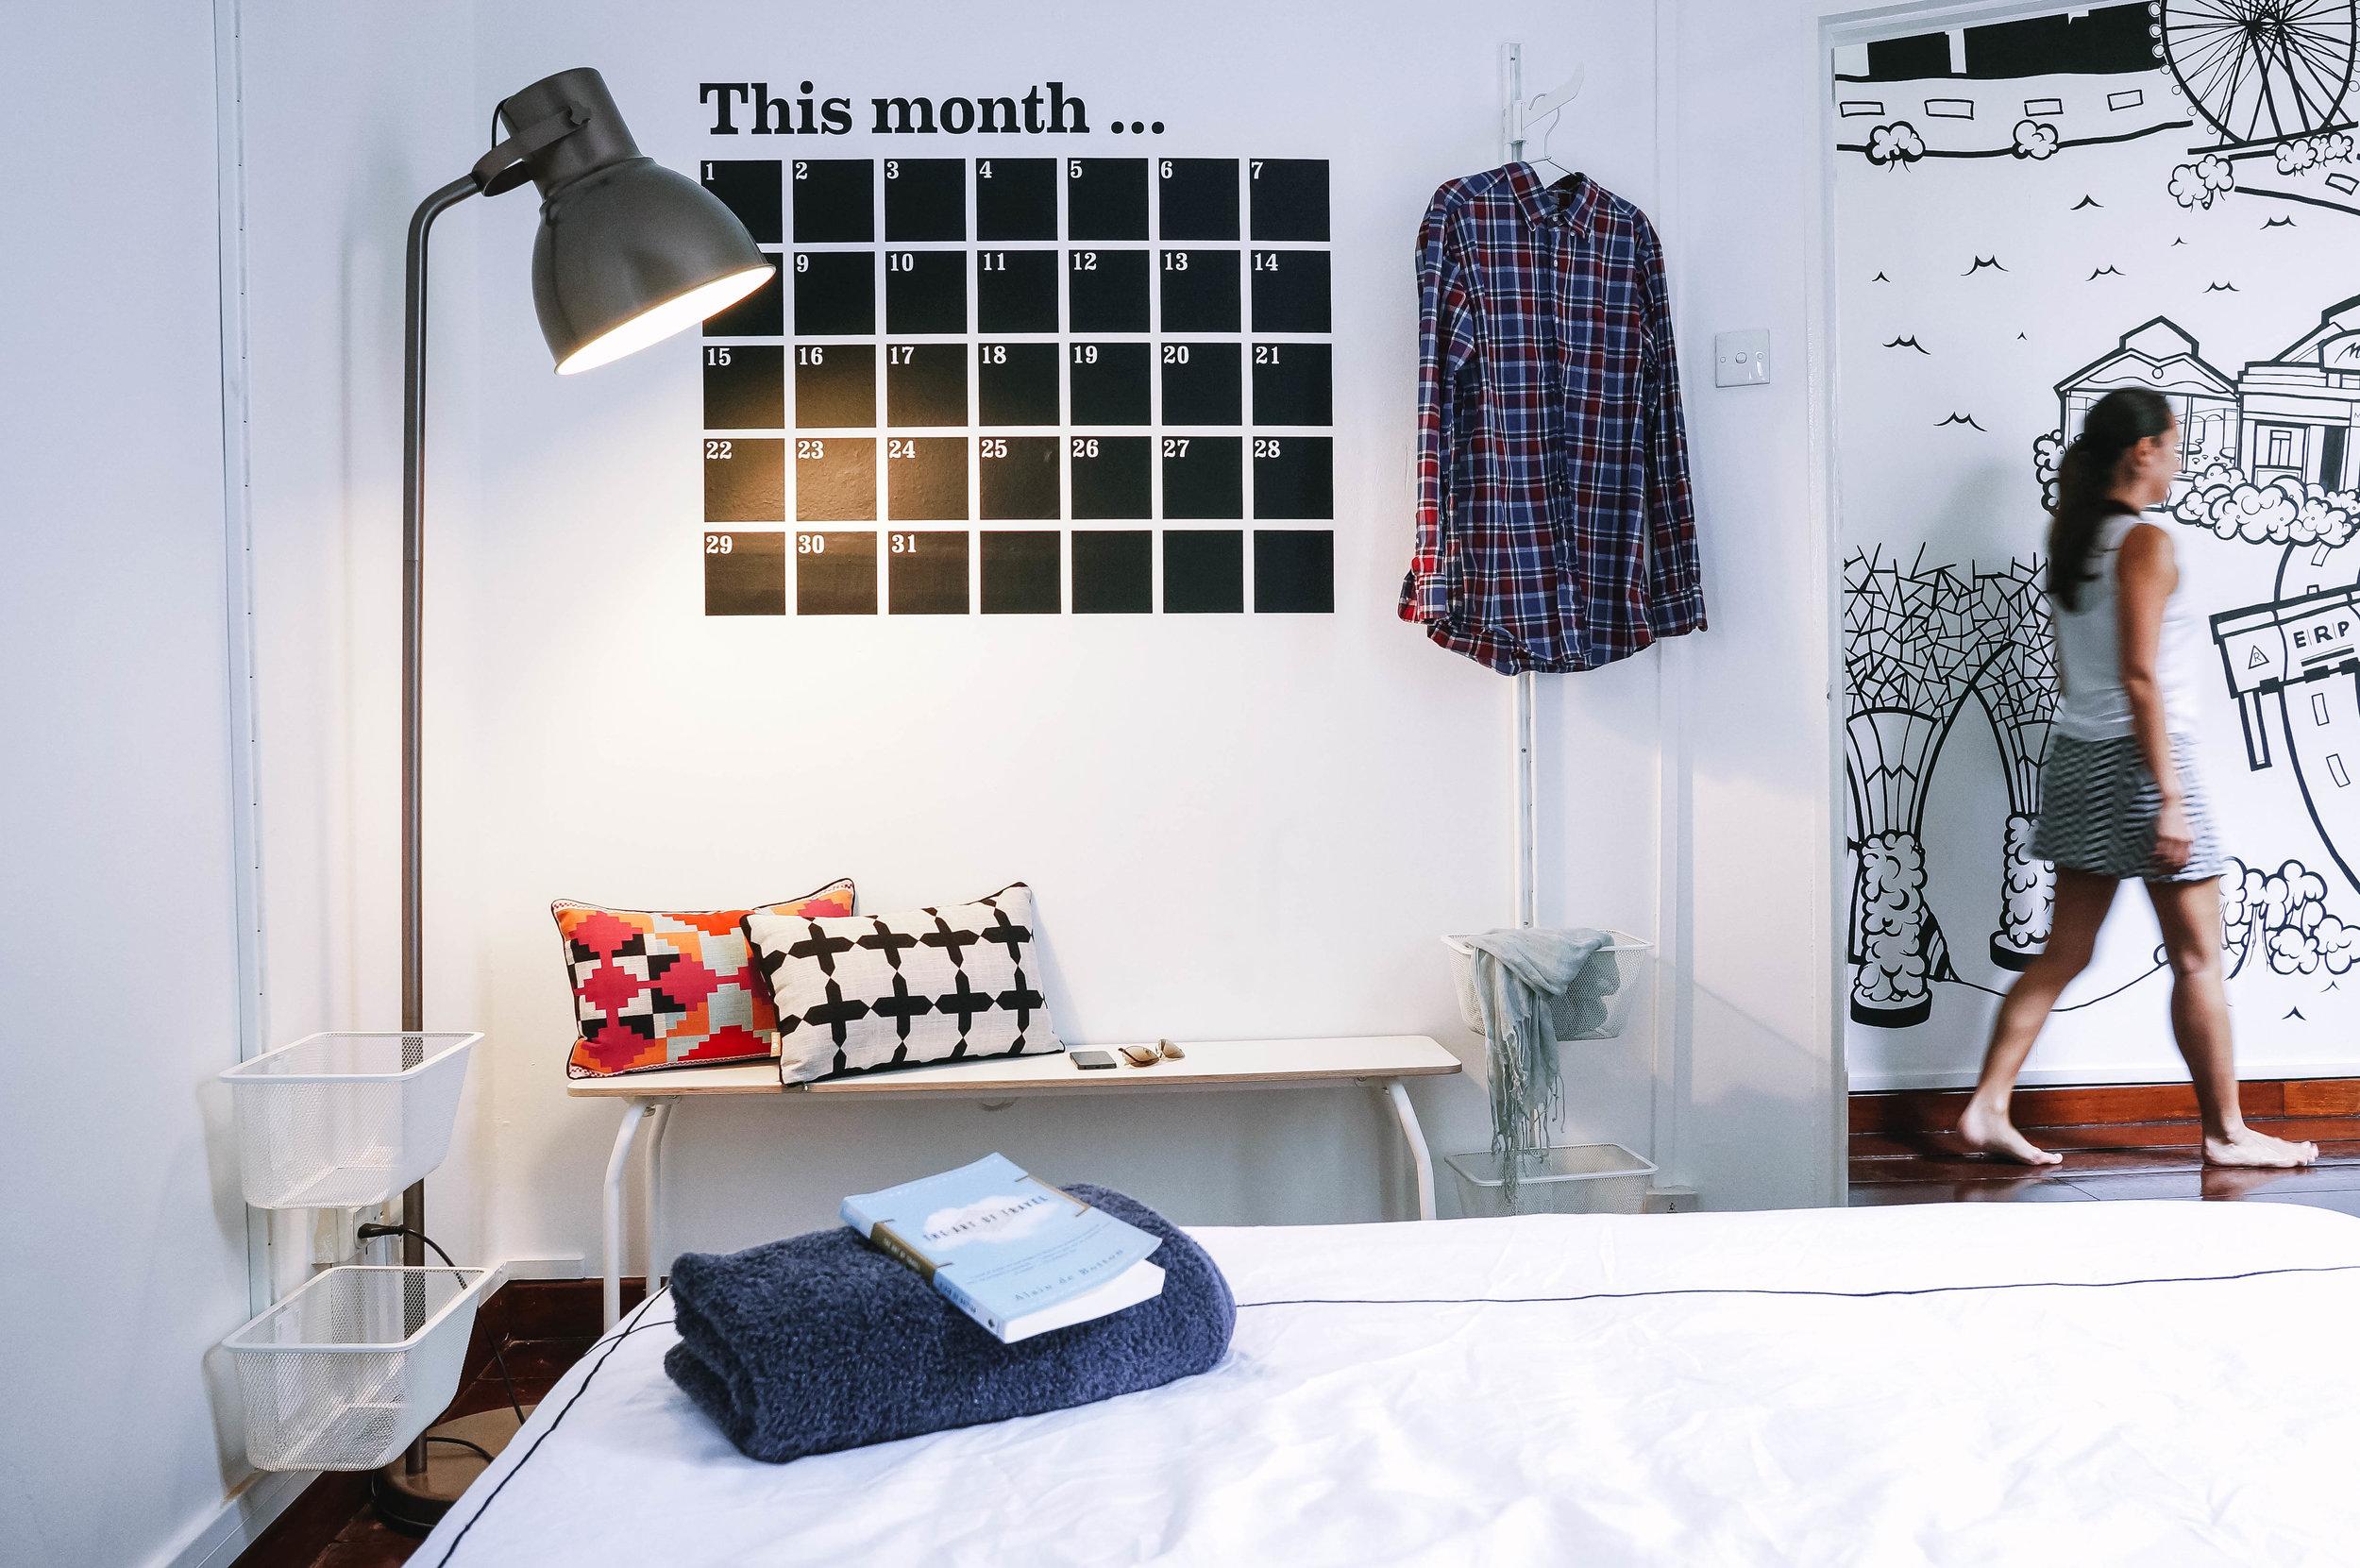 Bedroom Wall Calendar Decor Inspo